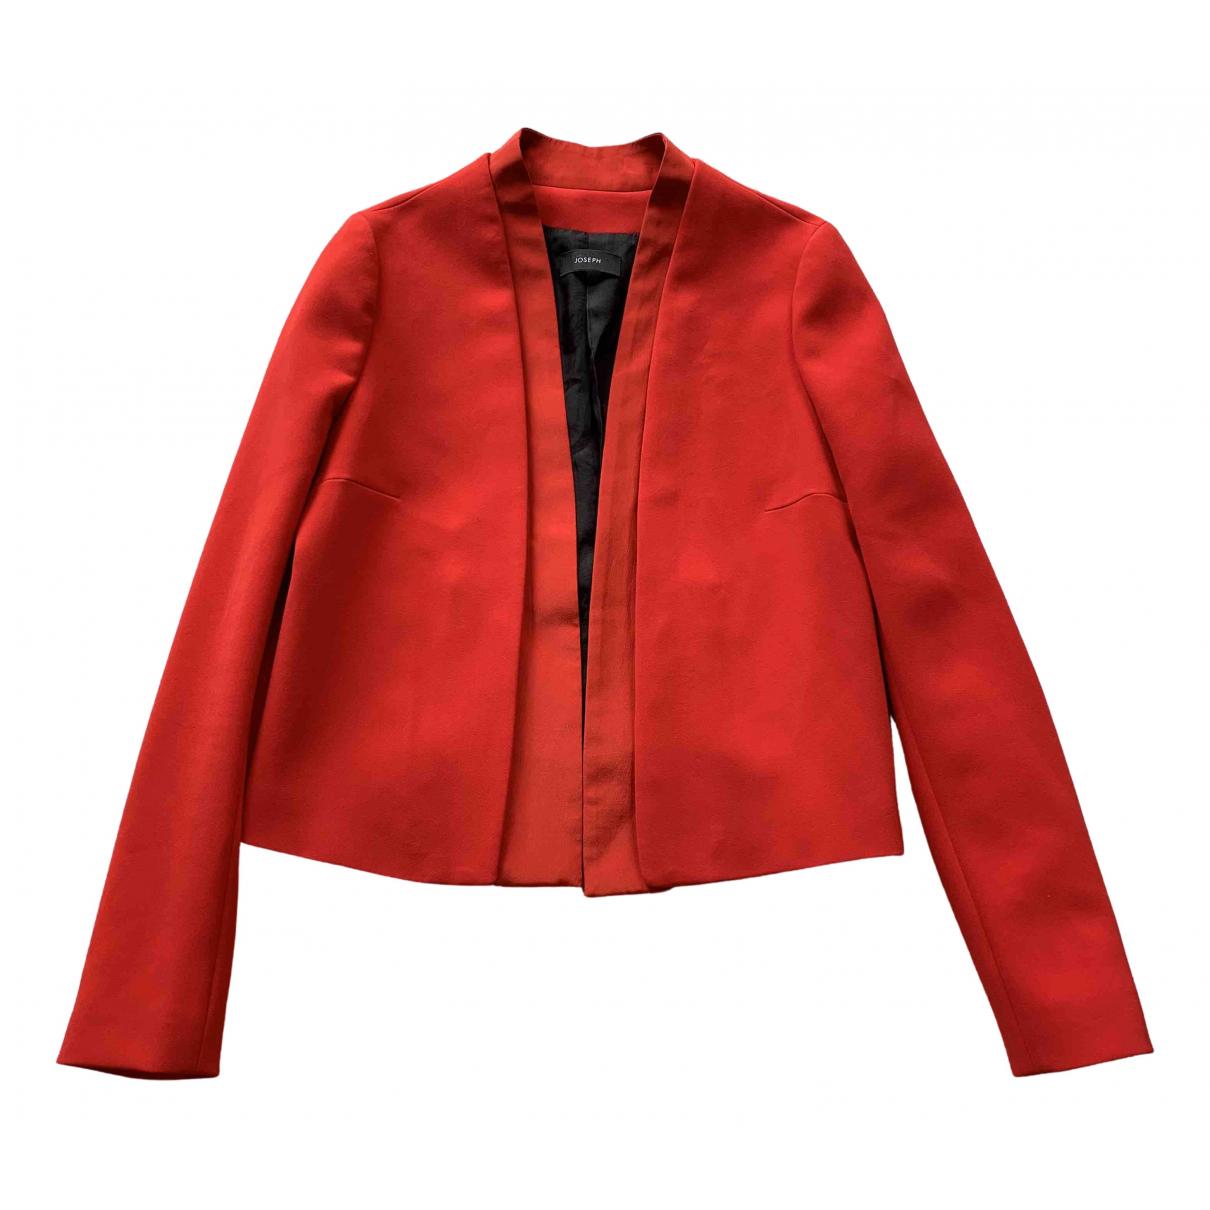 Joseph \N Jacke in  Rot Polyester